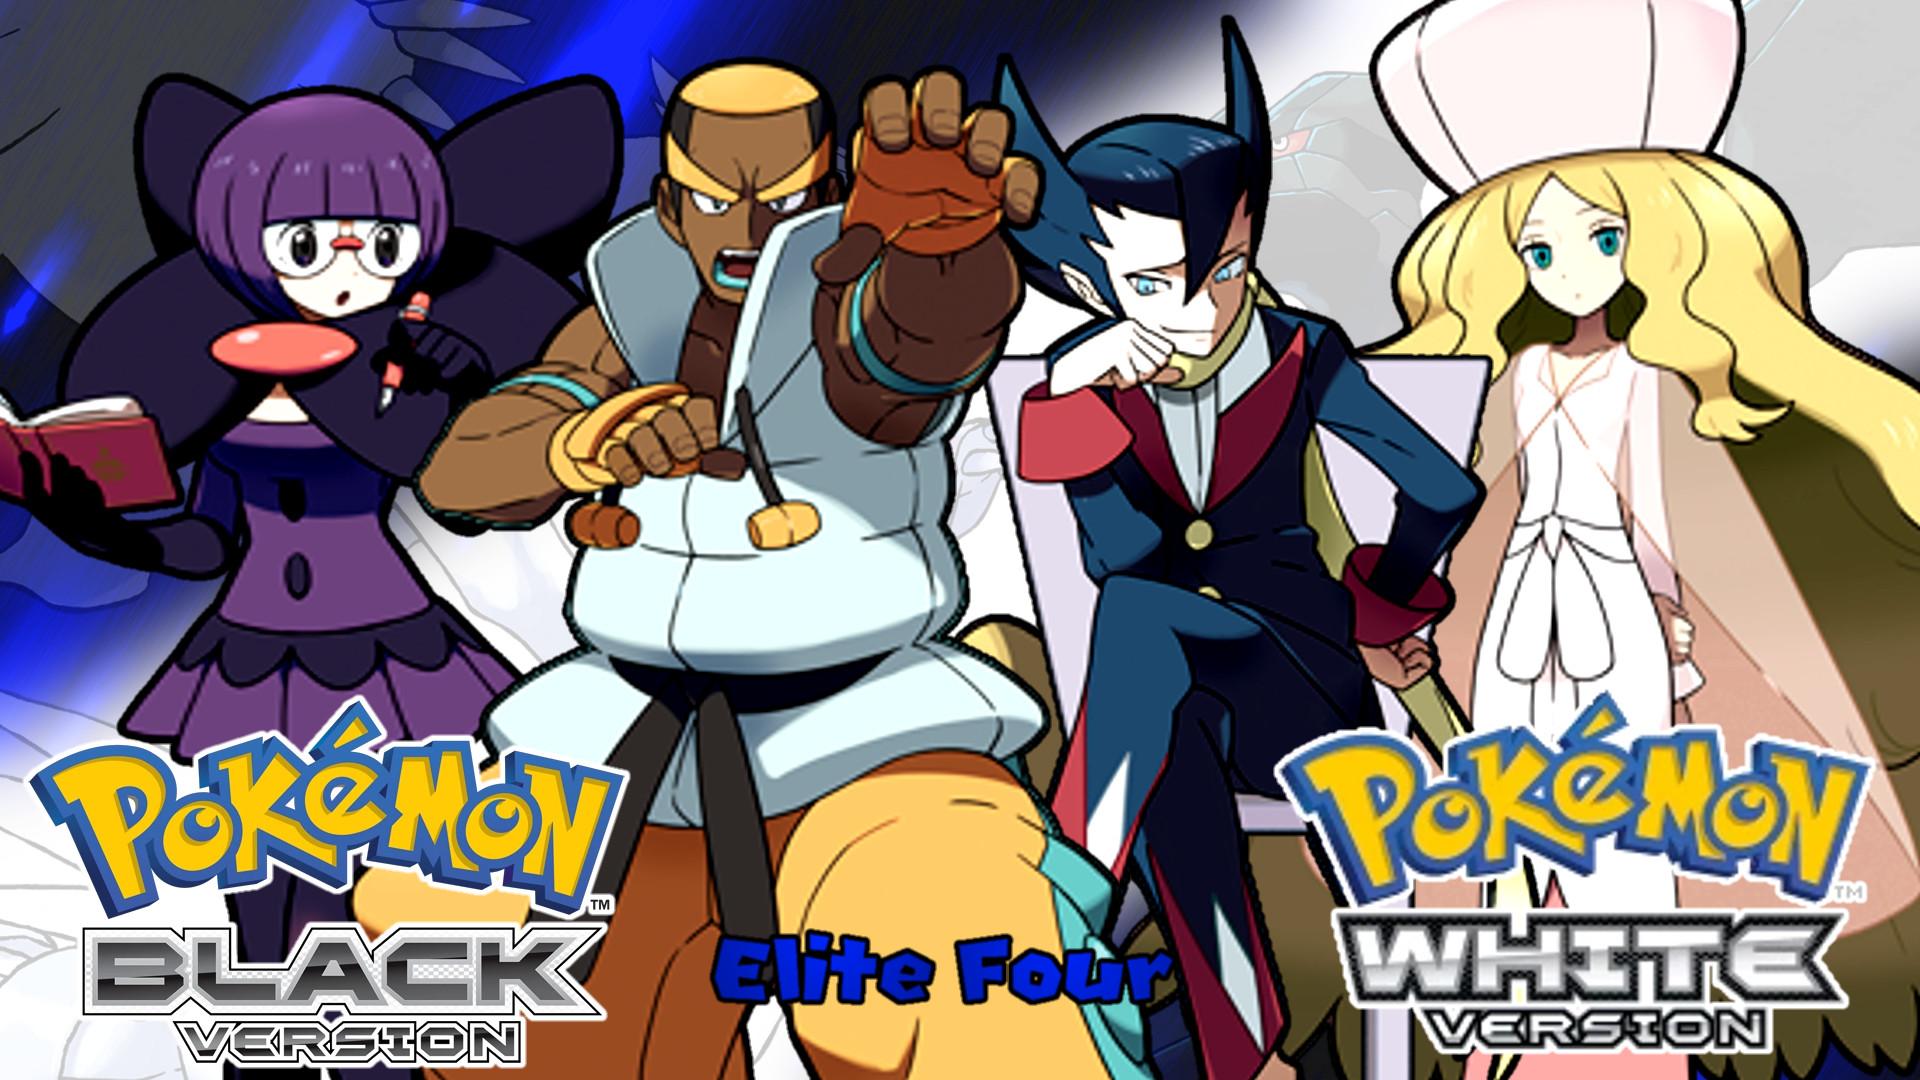 … Pokemon Black and White- The Elite Four Wallpaper by MattPlaysVG